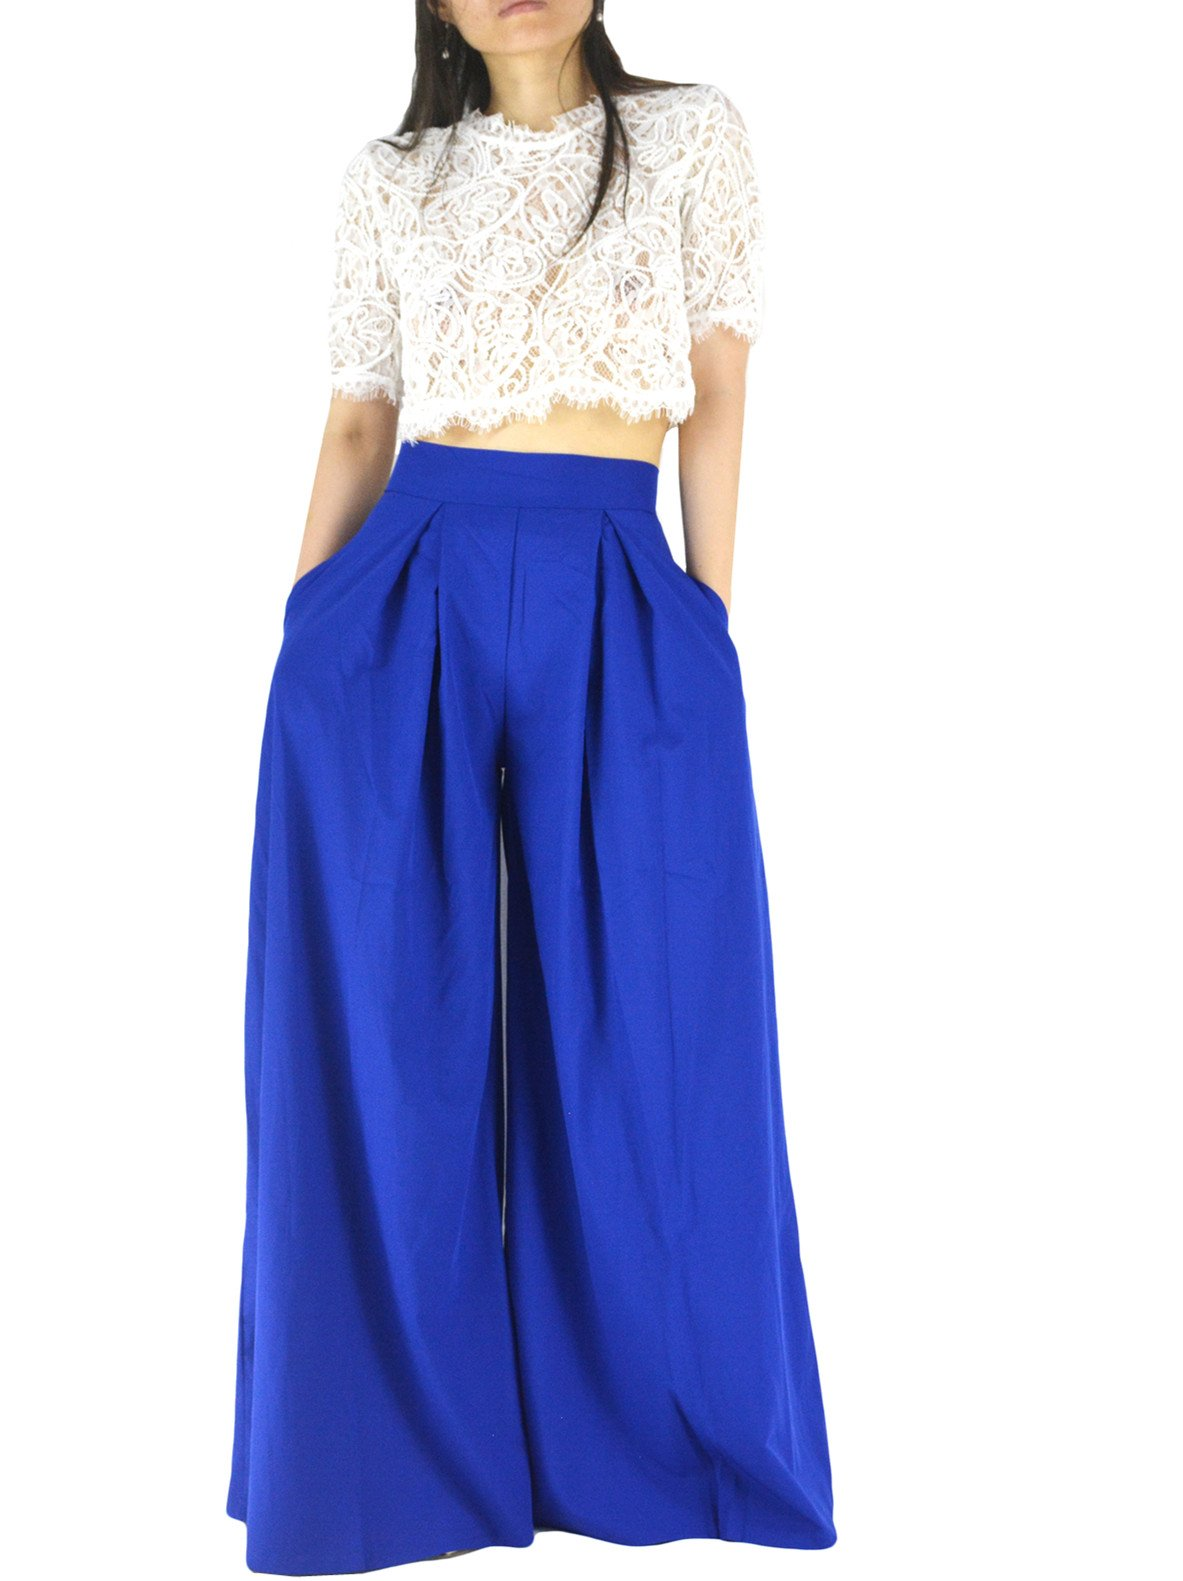 YSJERA Women's Sexy Semi Sheer Short Sleeve Lace Crop Top w/High Waist Palazzo Pants 2 Pieces Jumpsuits